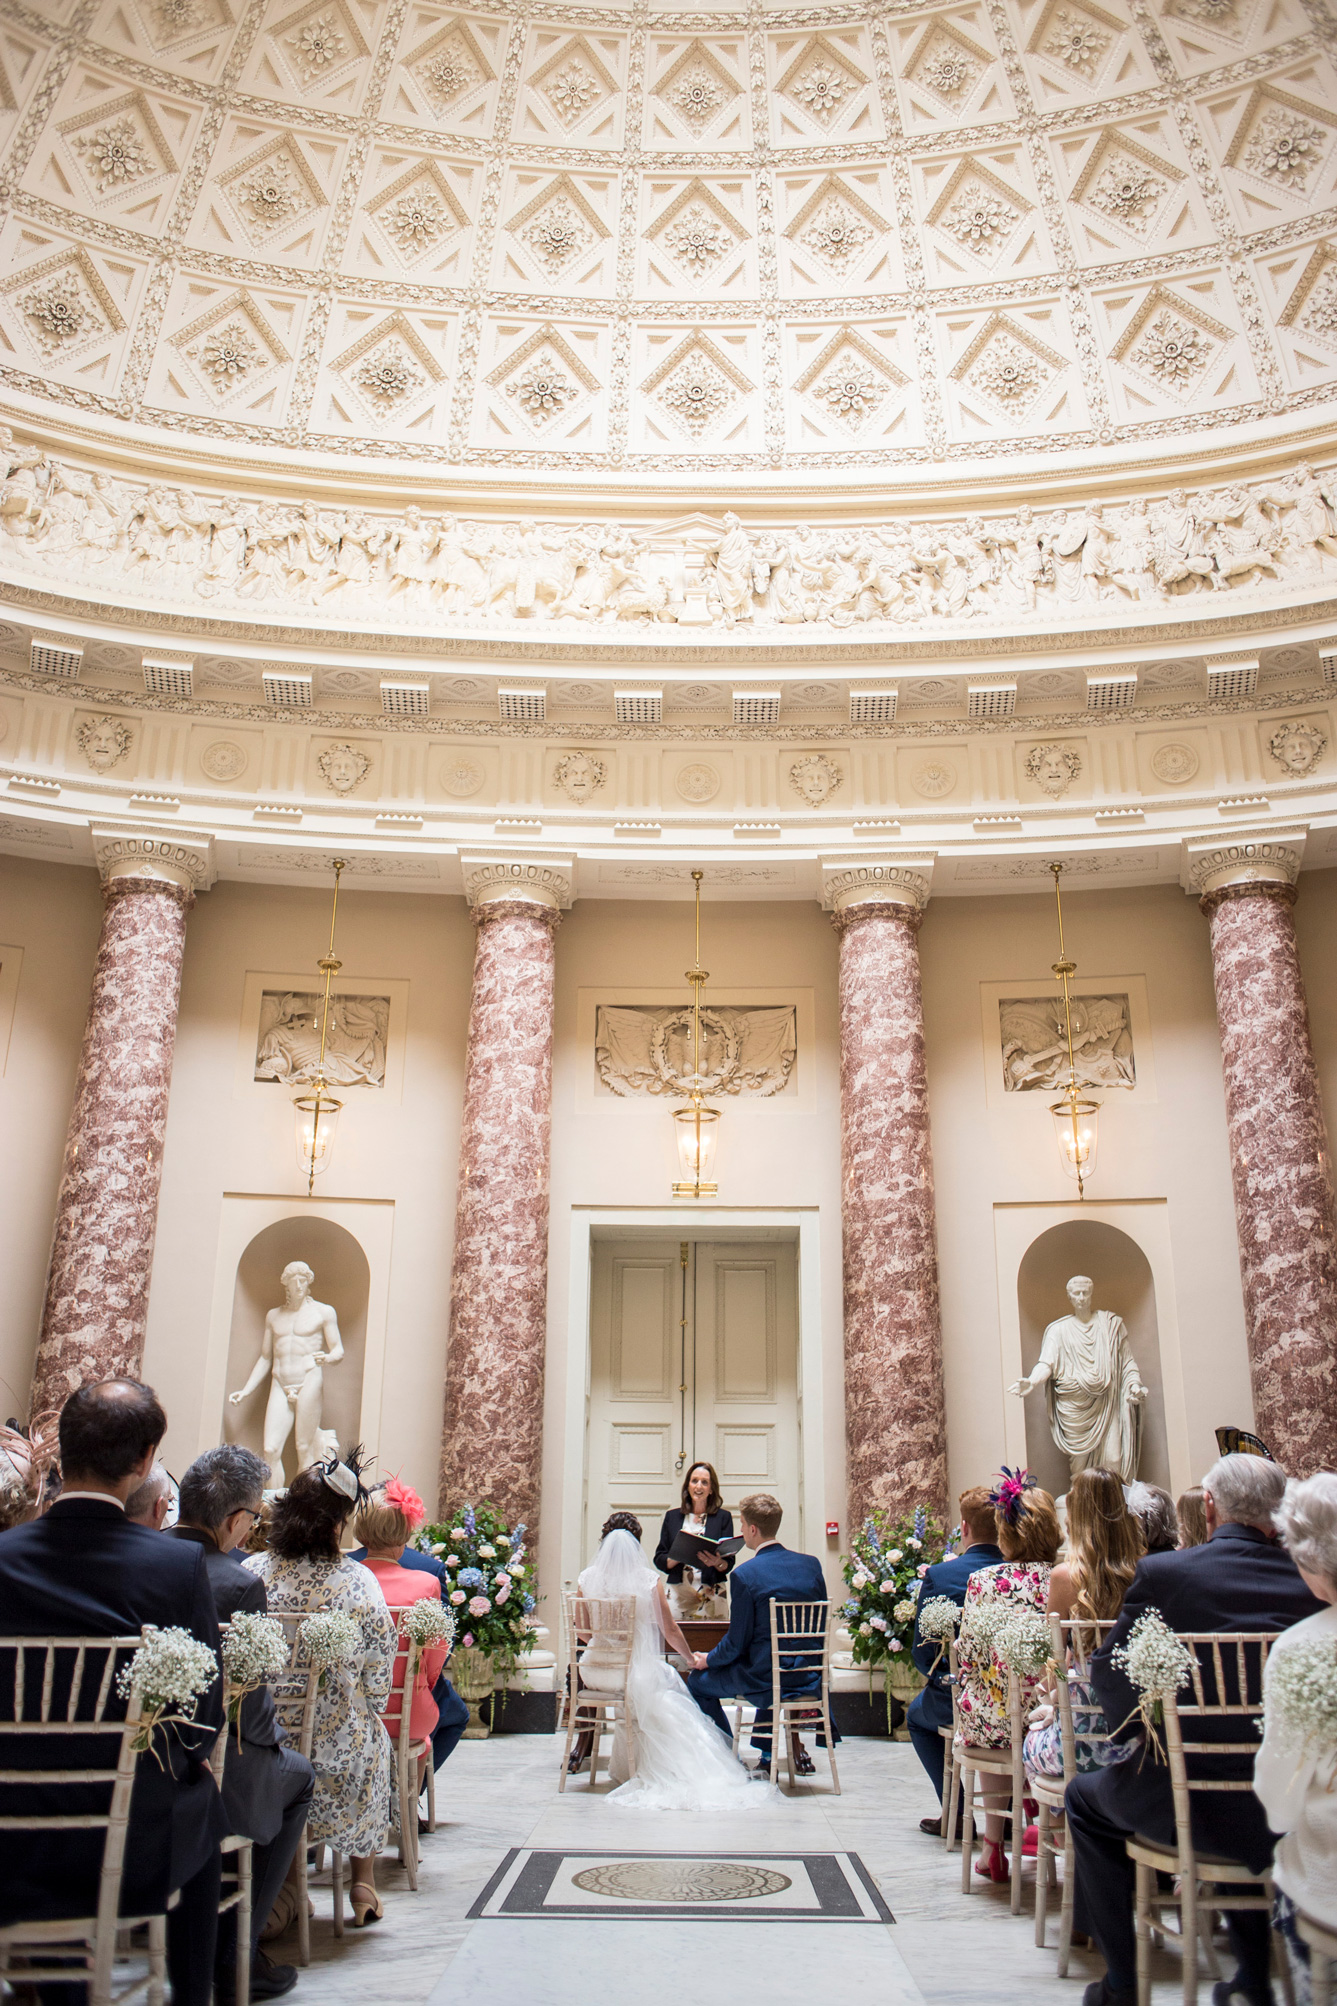 Ceremony room, bride, groom, marble,